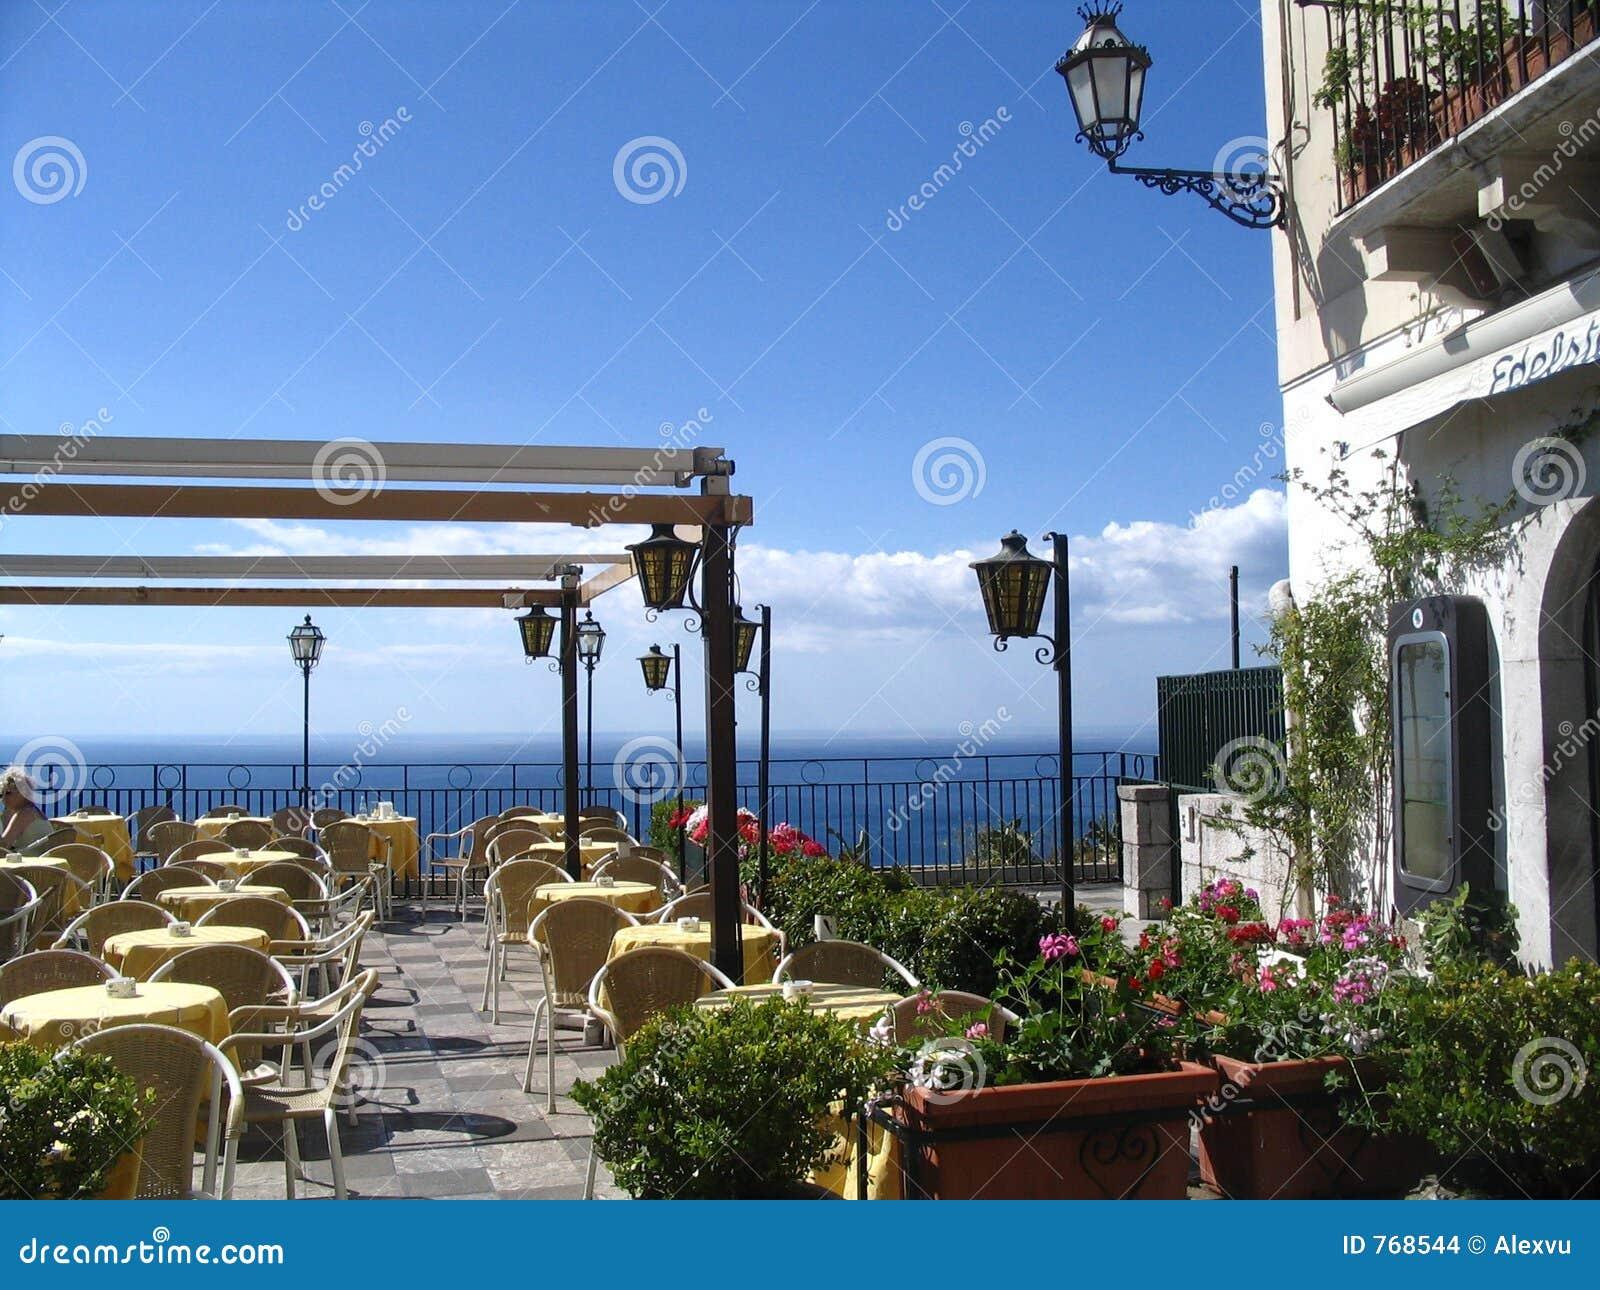 taormina, old town